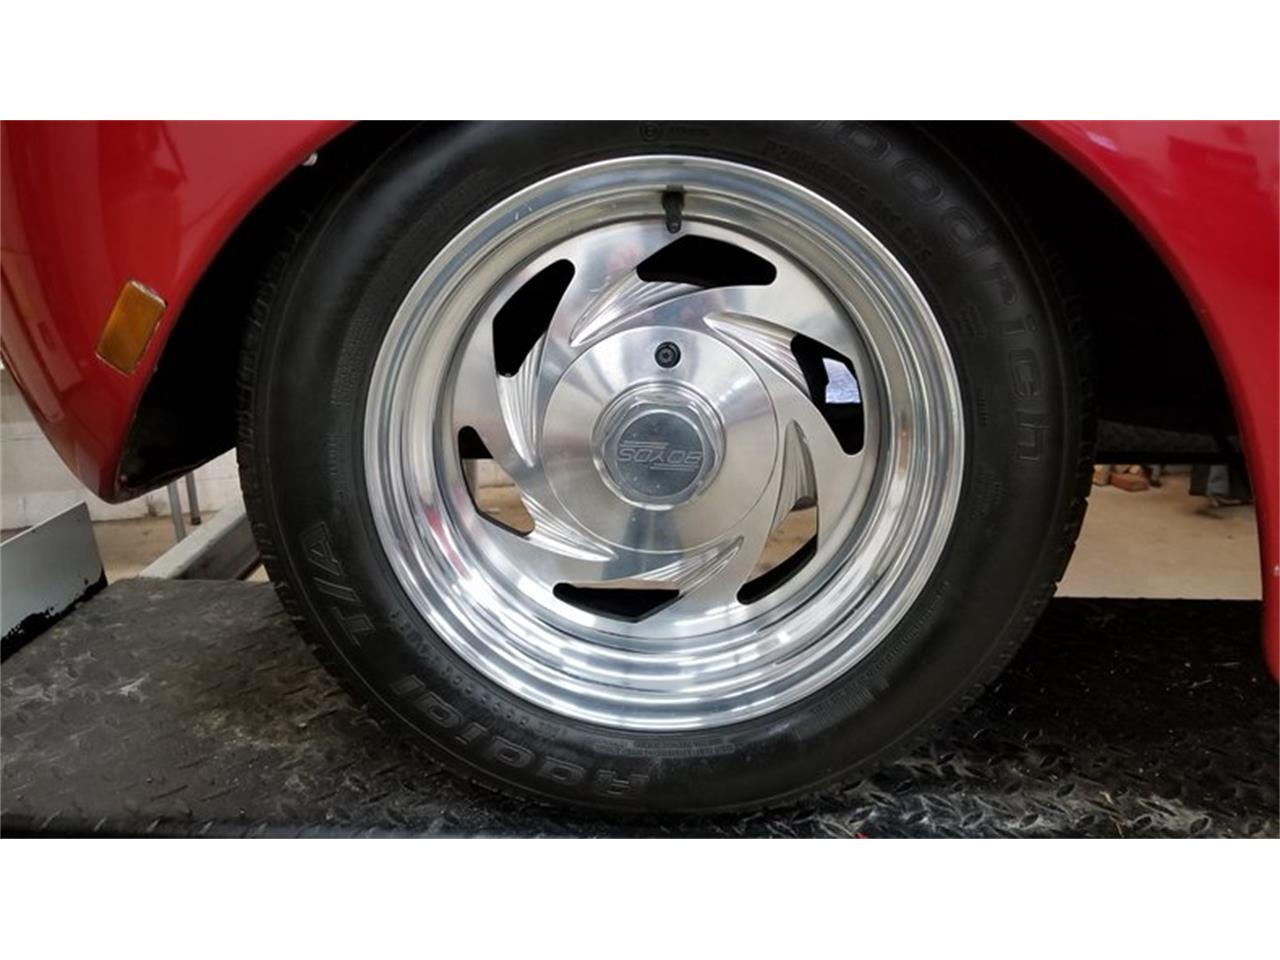 Mankato Car Dealers >> 1941 Chevrolet Master for Sale | ClassicCars.com | CC-1203674